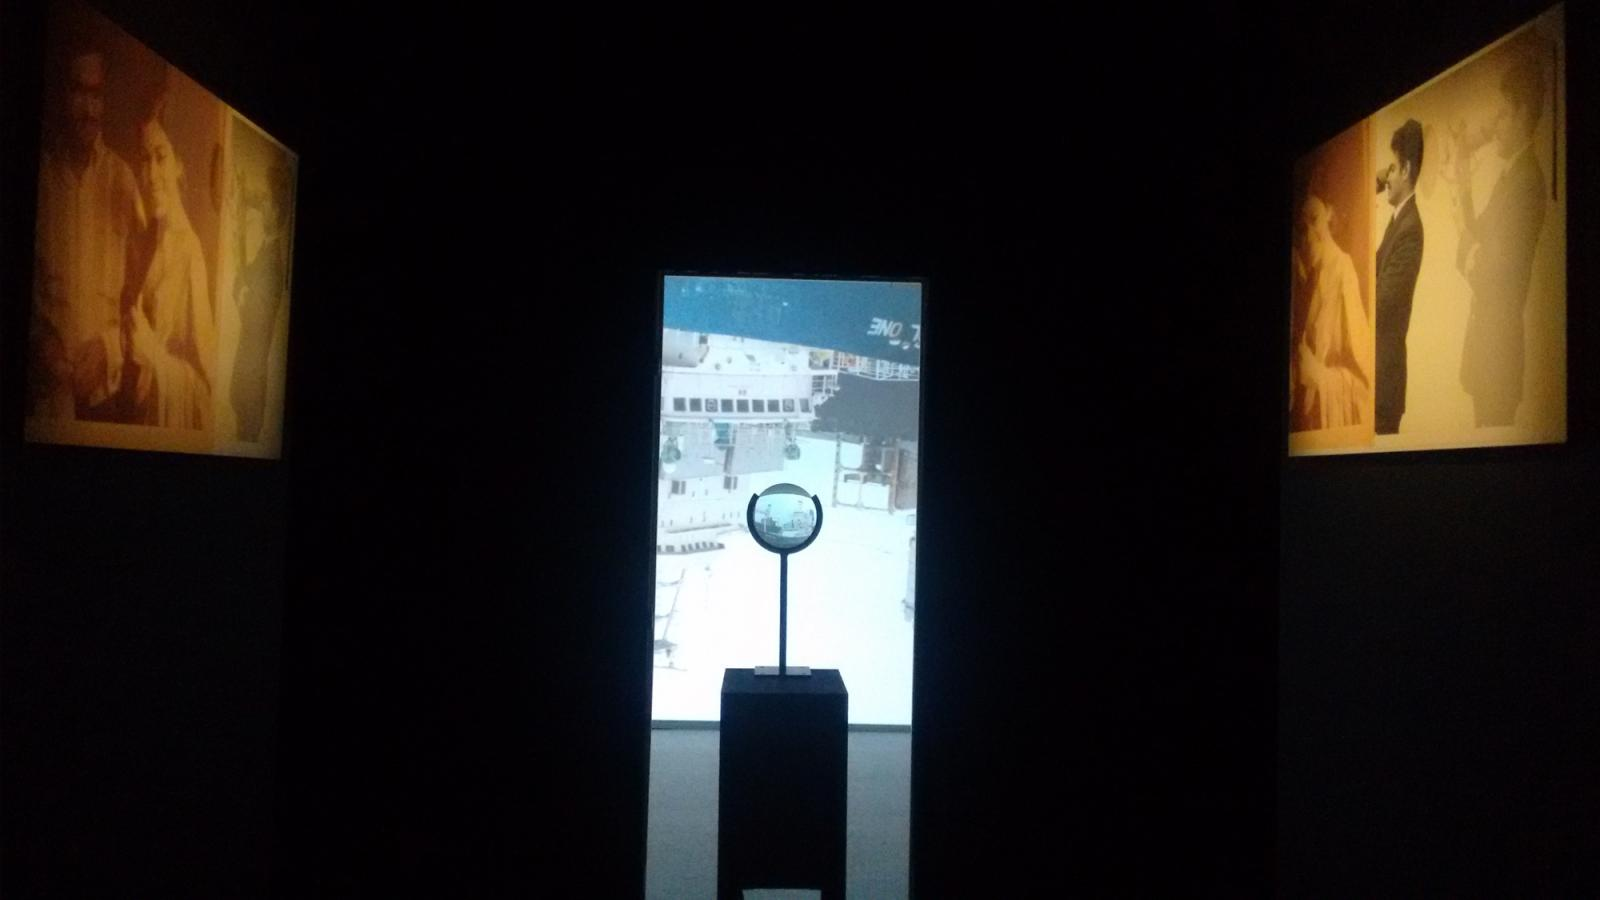 Ranjit Kandalgaonkar /Porthole, Sextant I & II/, 2016 Lens Assembly, Single channel video